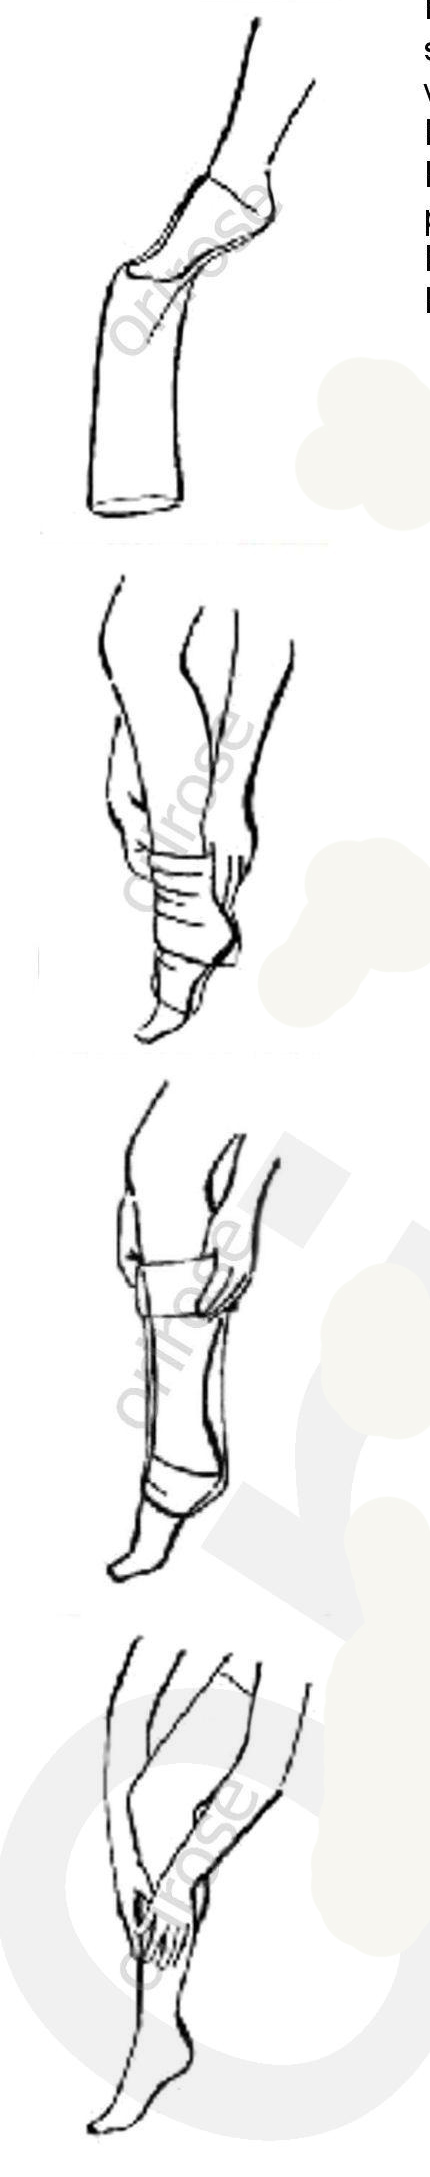 Strumpfhose Stütz-Strumpfhose Shapewear Formend OriRose 0060 Inka